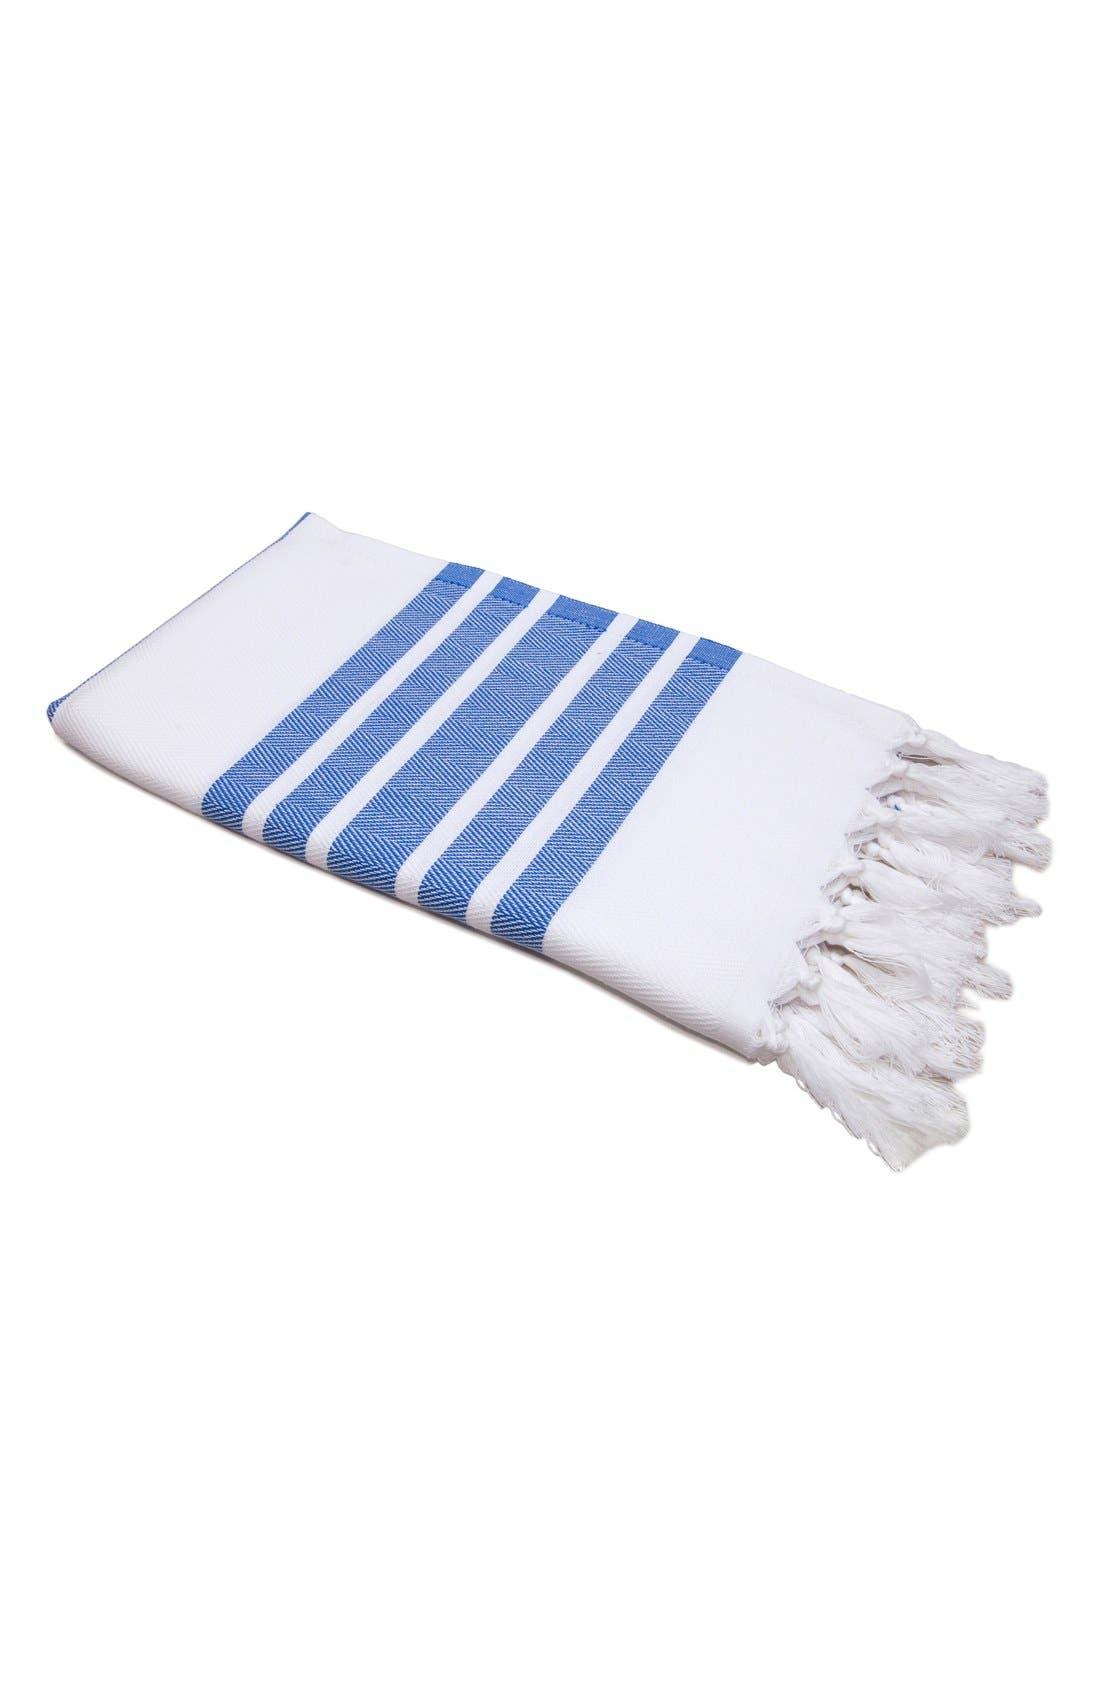 Herringbone Striped Turkish Pestemal Towel,                         Main,                         color, Royal Blue/ White